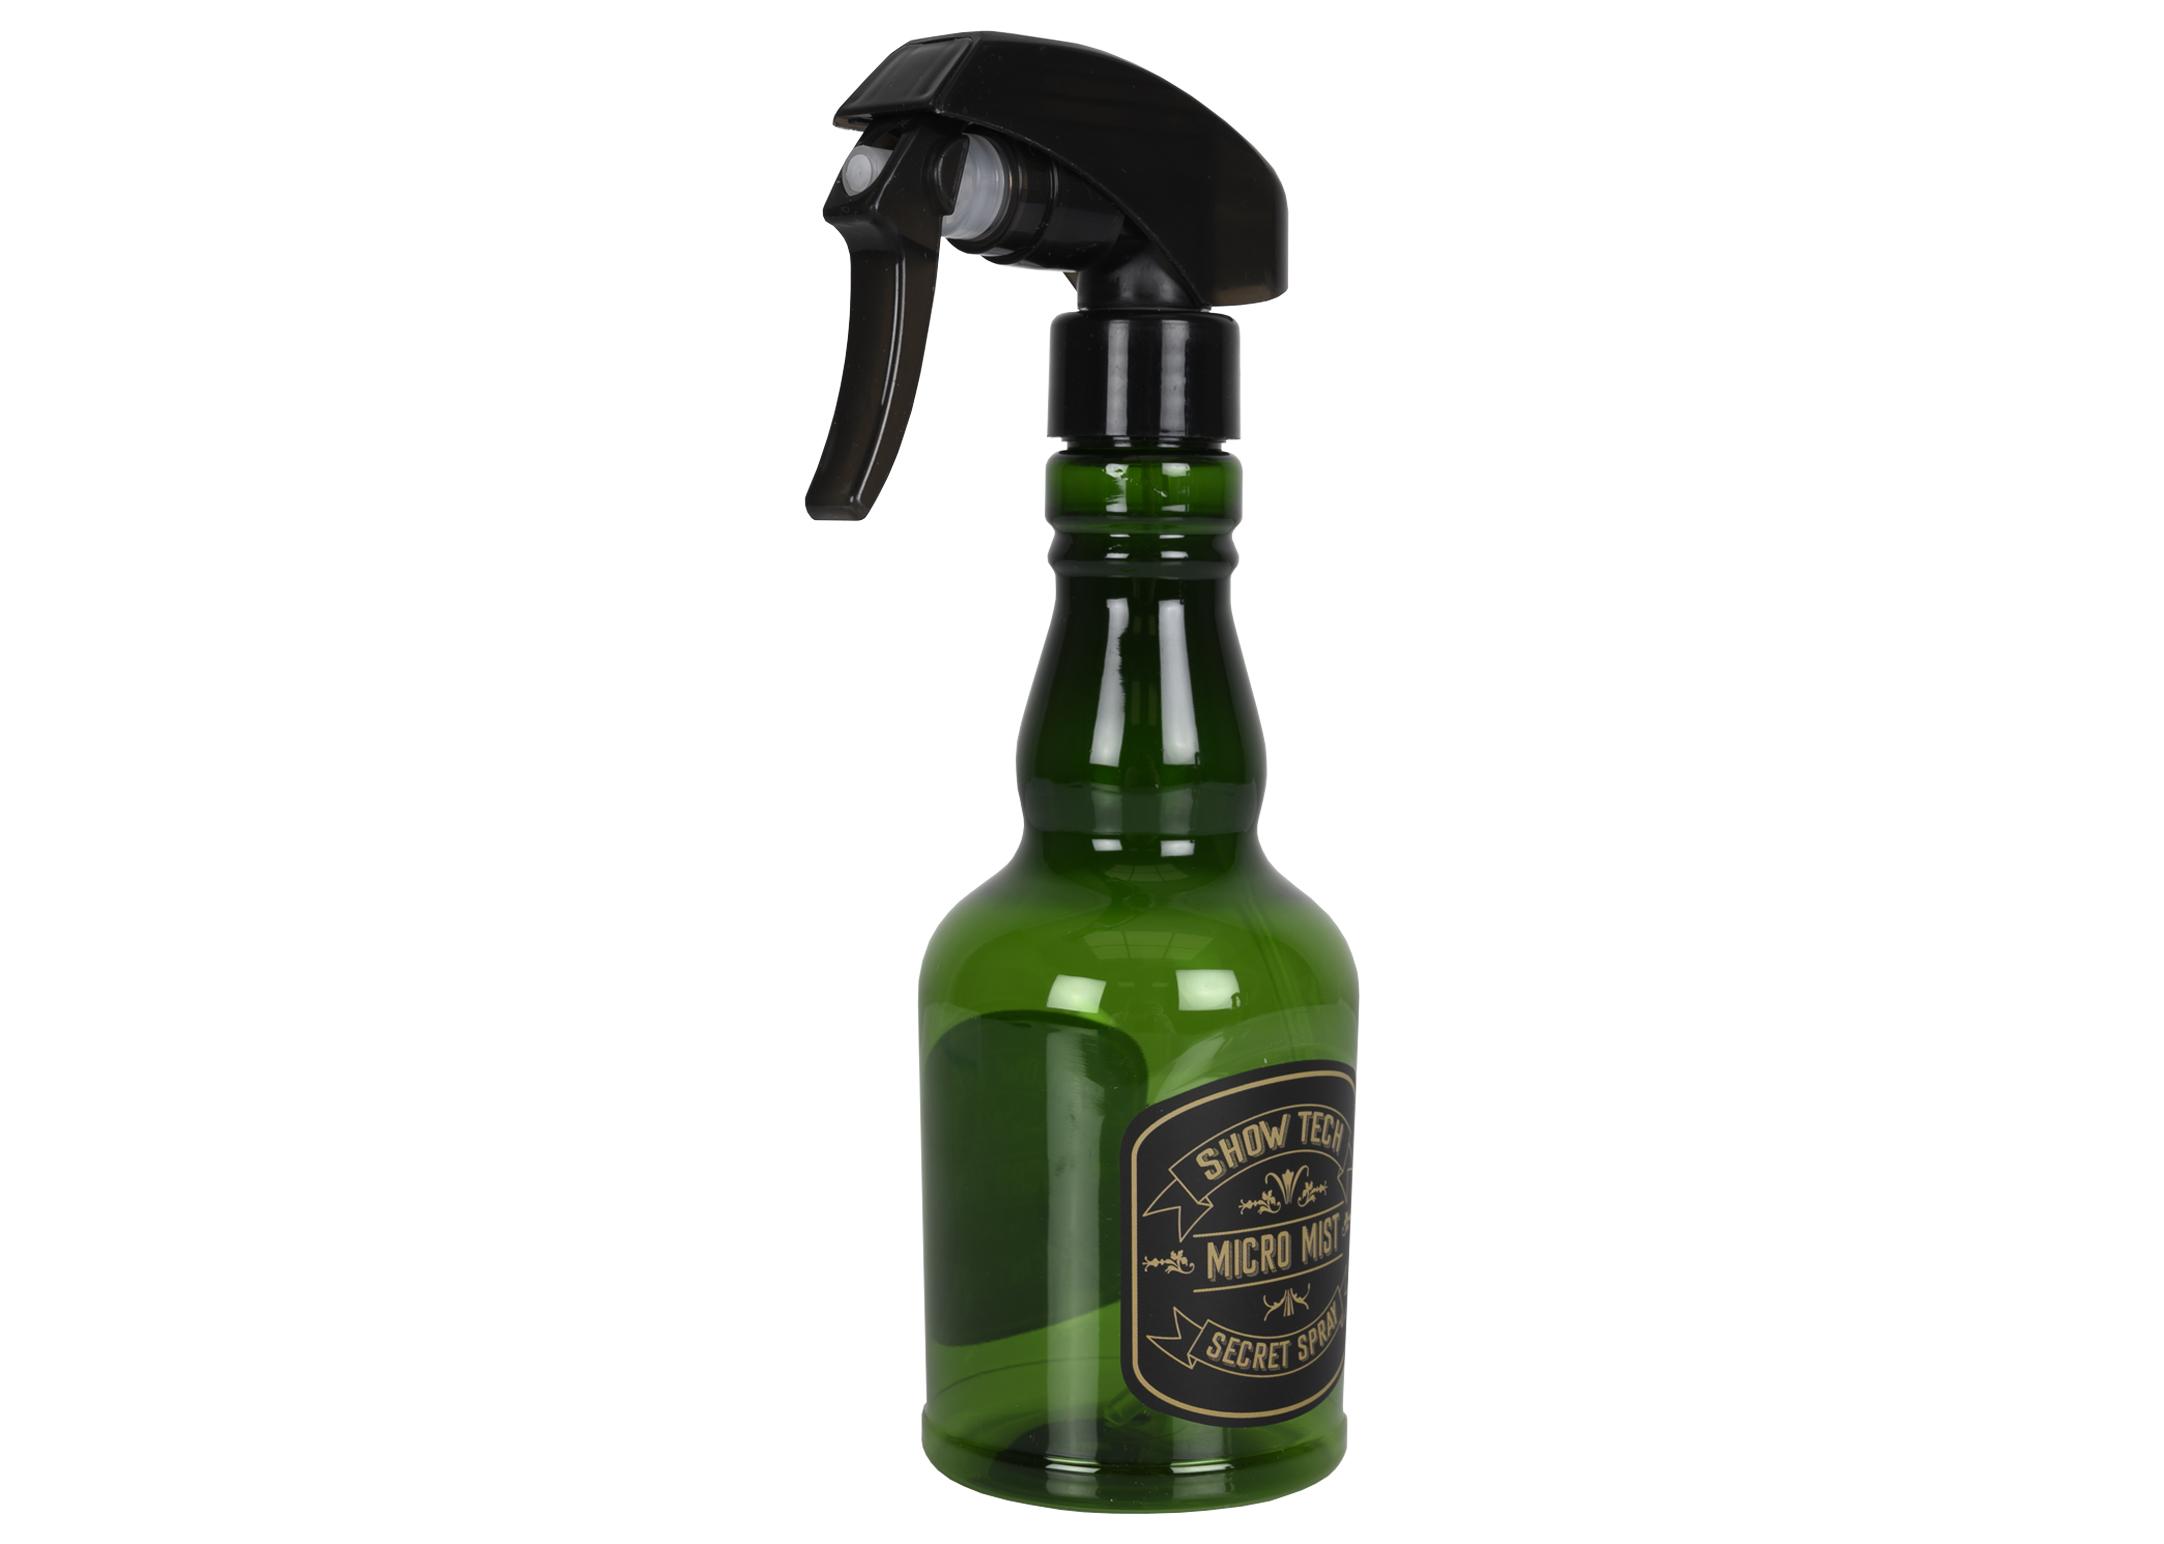 Show Tech Exclusive Salon Micro Mist Bottle Green 150ml